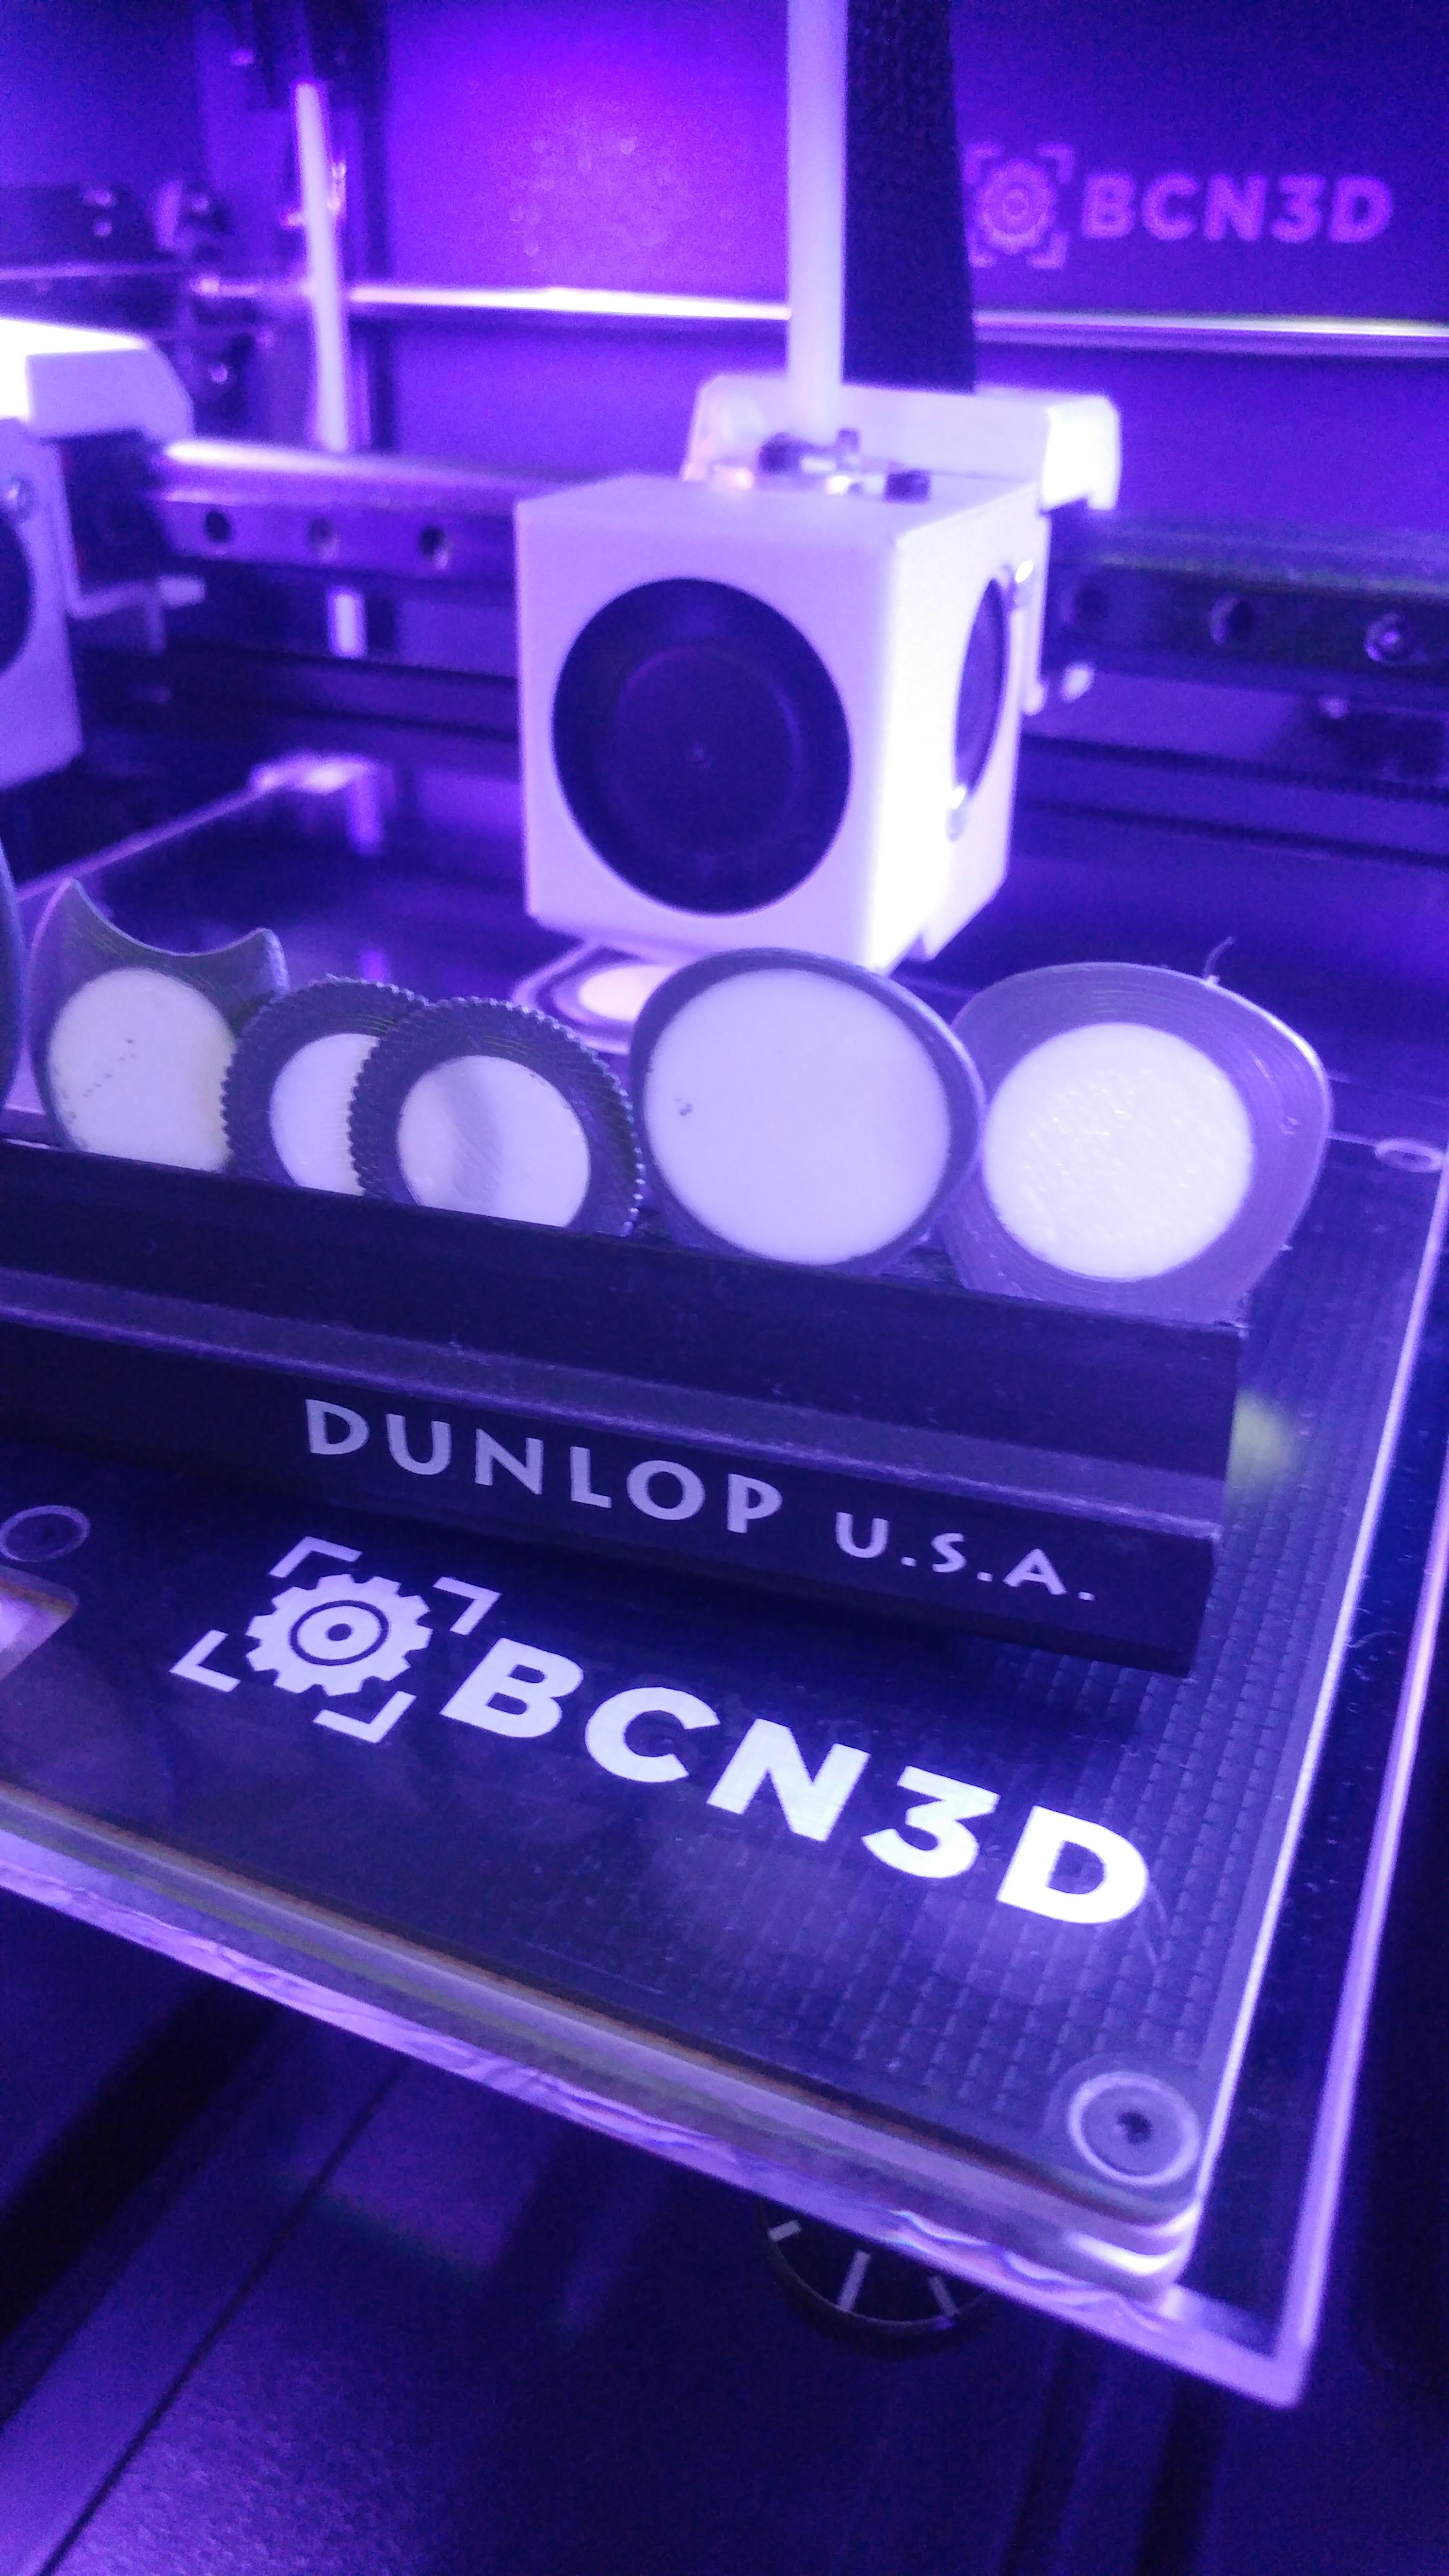 BCEE0121-EAB3-4BA8-8CB4-DC62BBA1C346.jpeg Download free STL file UNU Pua Nido (Nest Pick Guitar) • 3D printable object, carleslluisar